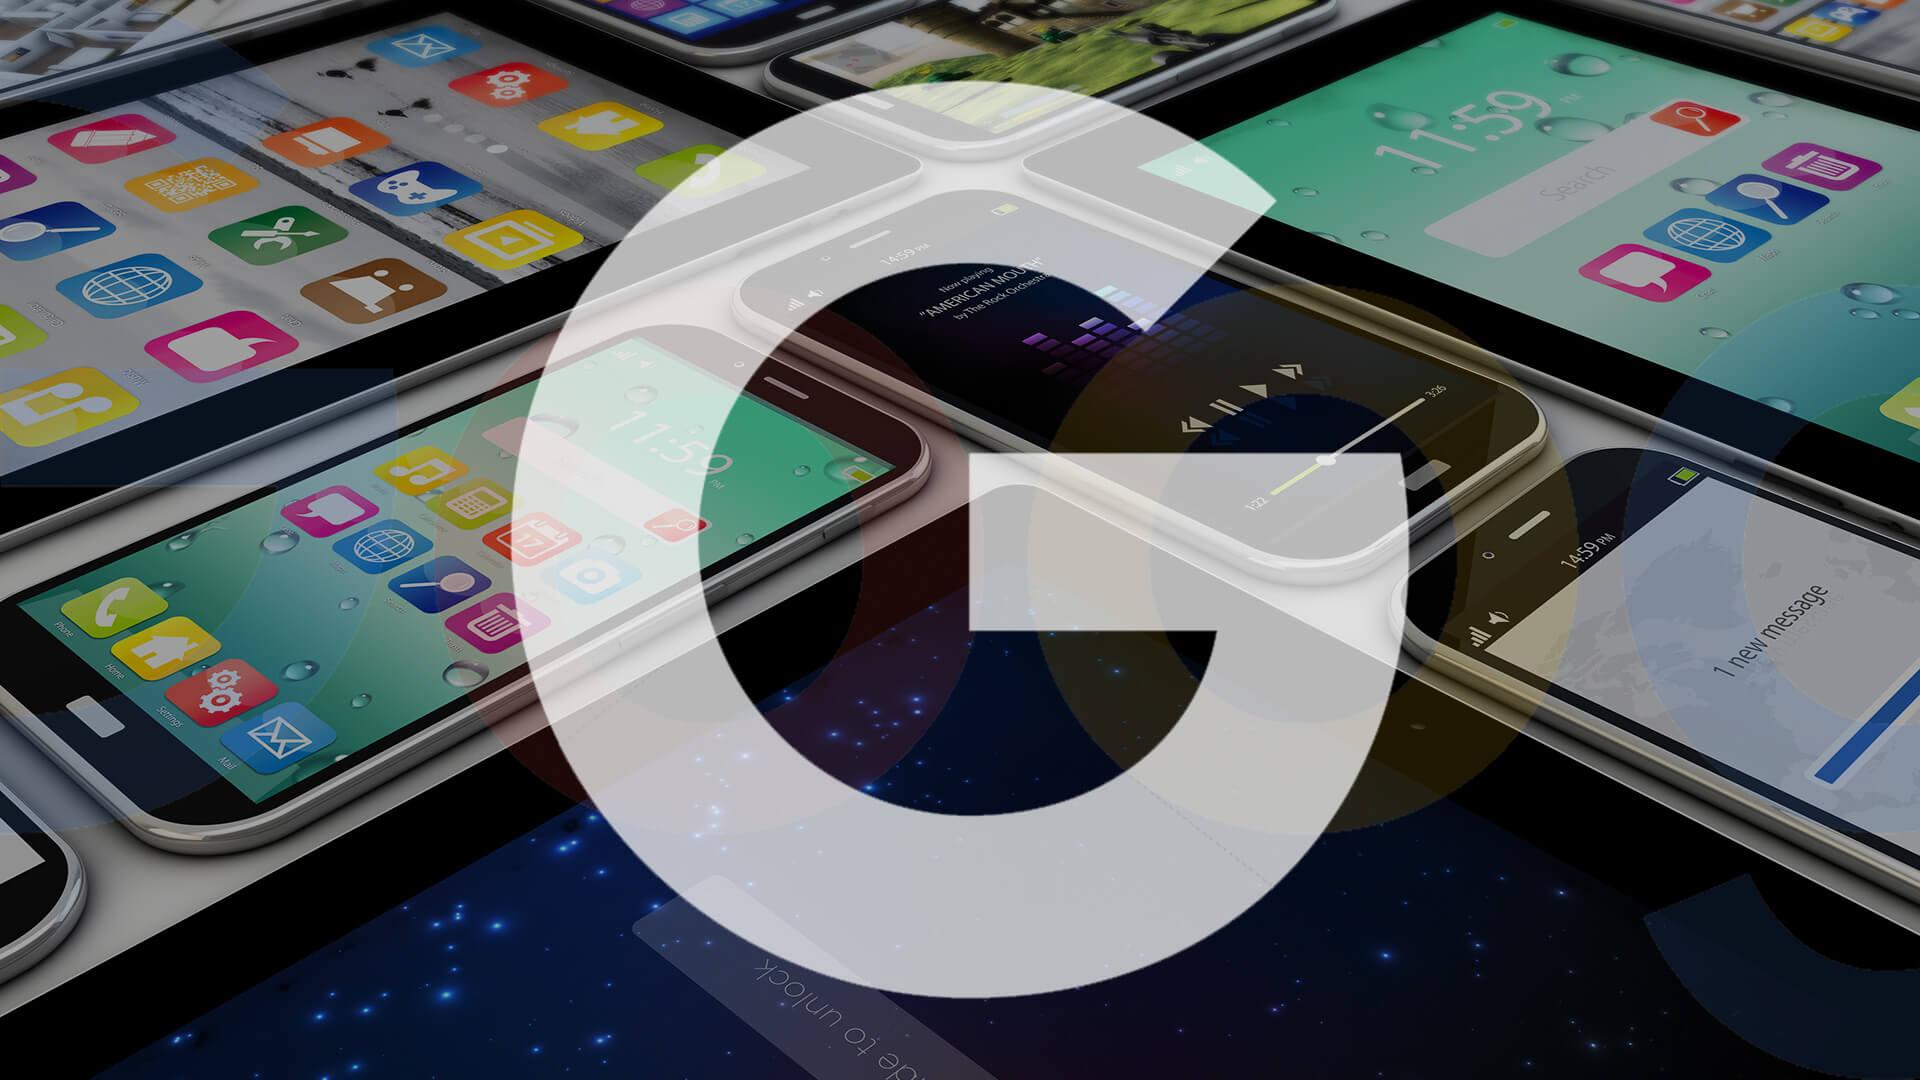 google-mobile2-fade-ss-1920